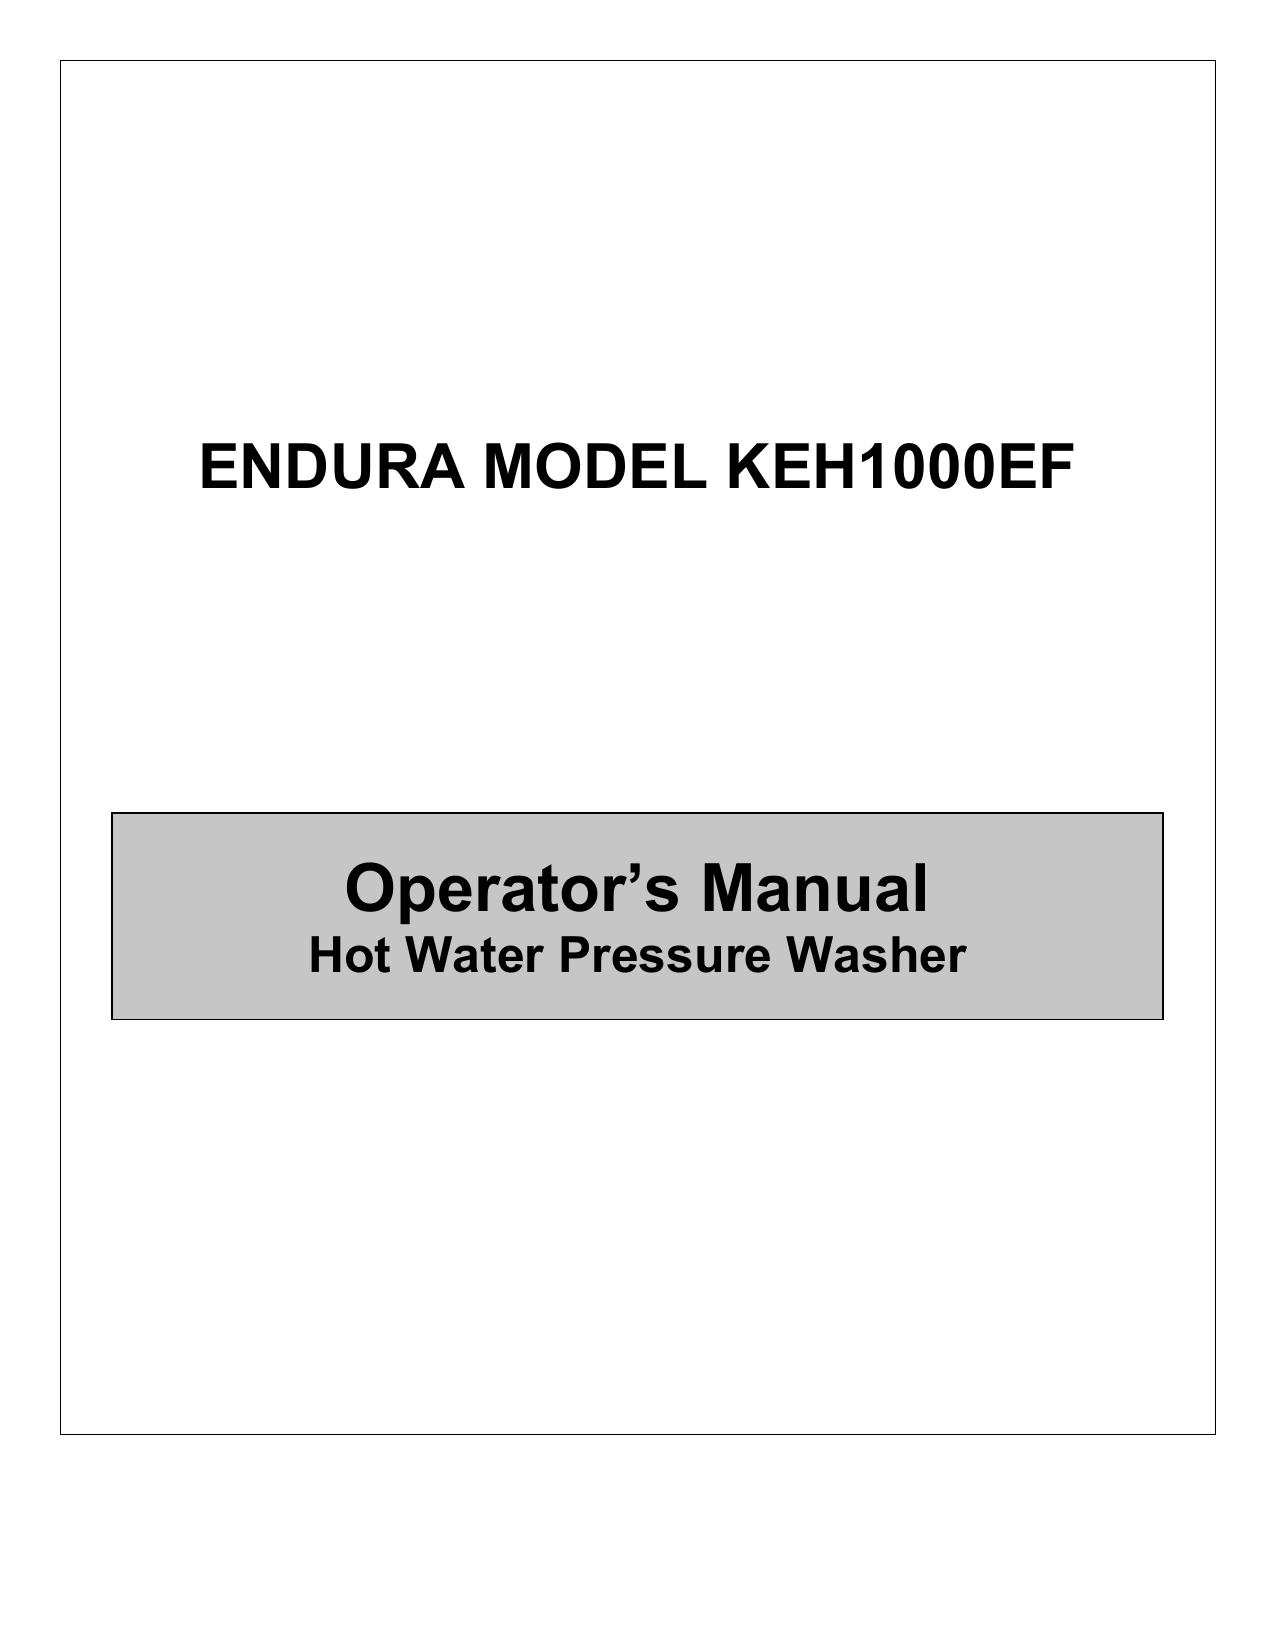 Operator's Manual ENDURA MODEL KEH1000EF Hot Water Pressure Washer |  manualzz.com